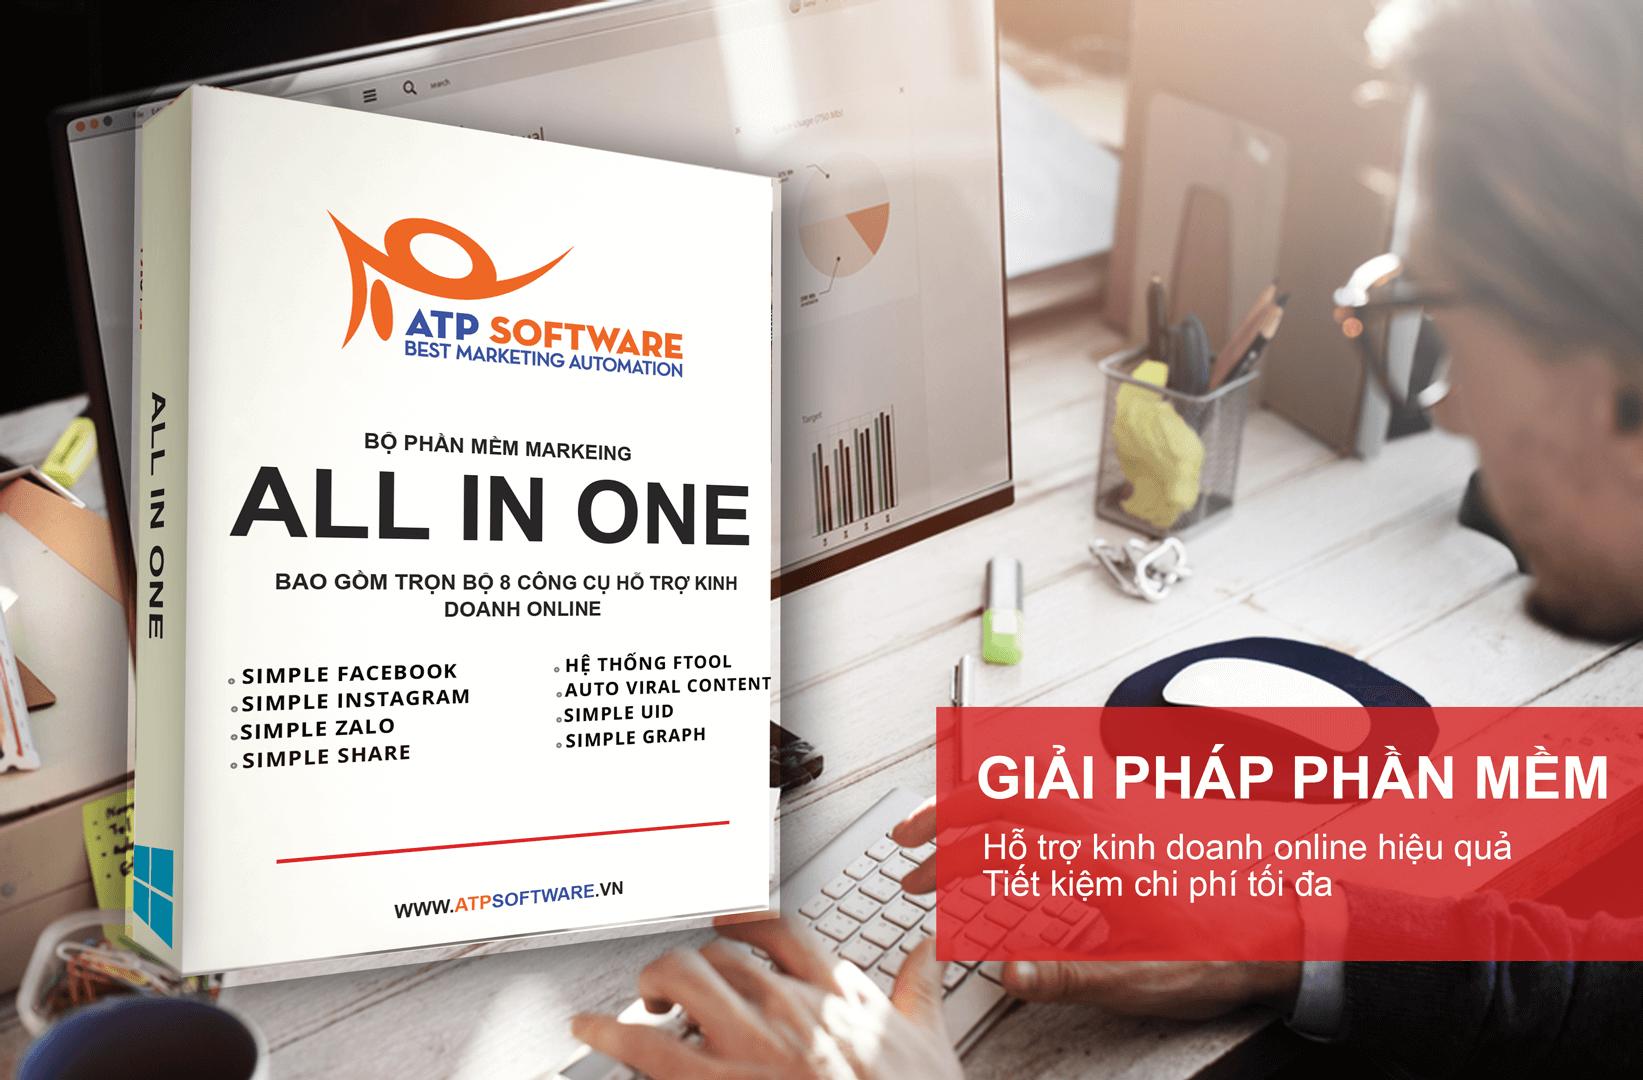 Phan mem marketing All-in-one ATP software